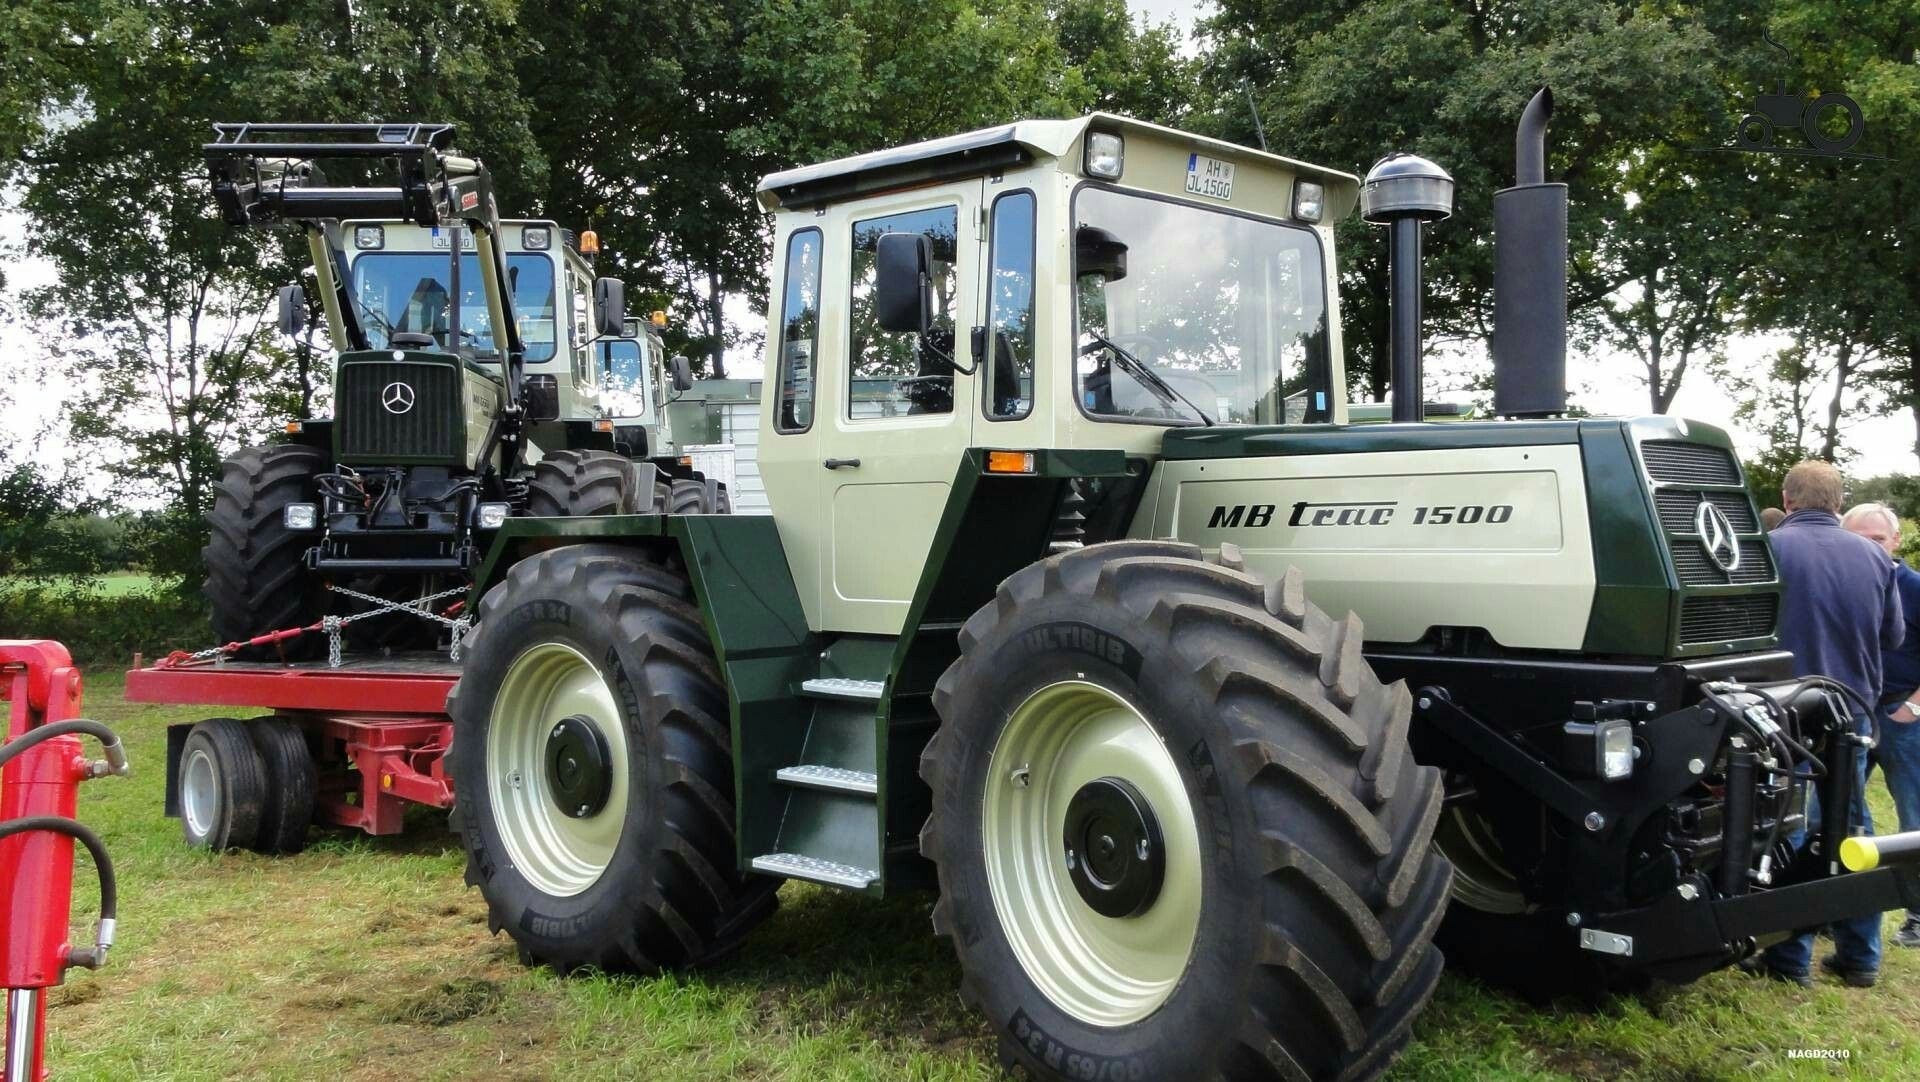 mb trac 1500 traktoren pinterest tractor and. Black Bedroom Furniture Sets. Home Design Ideas